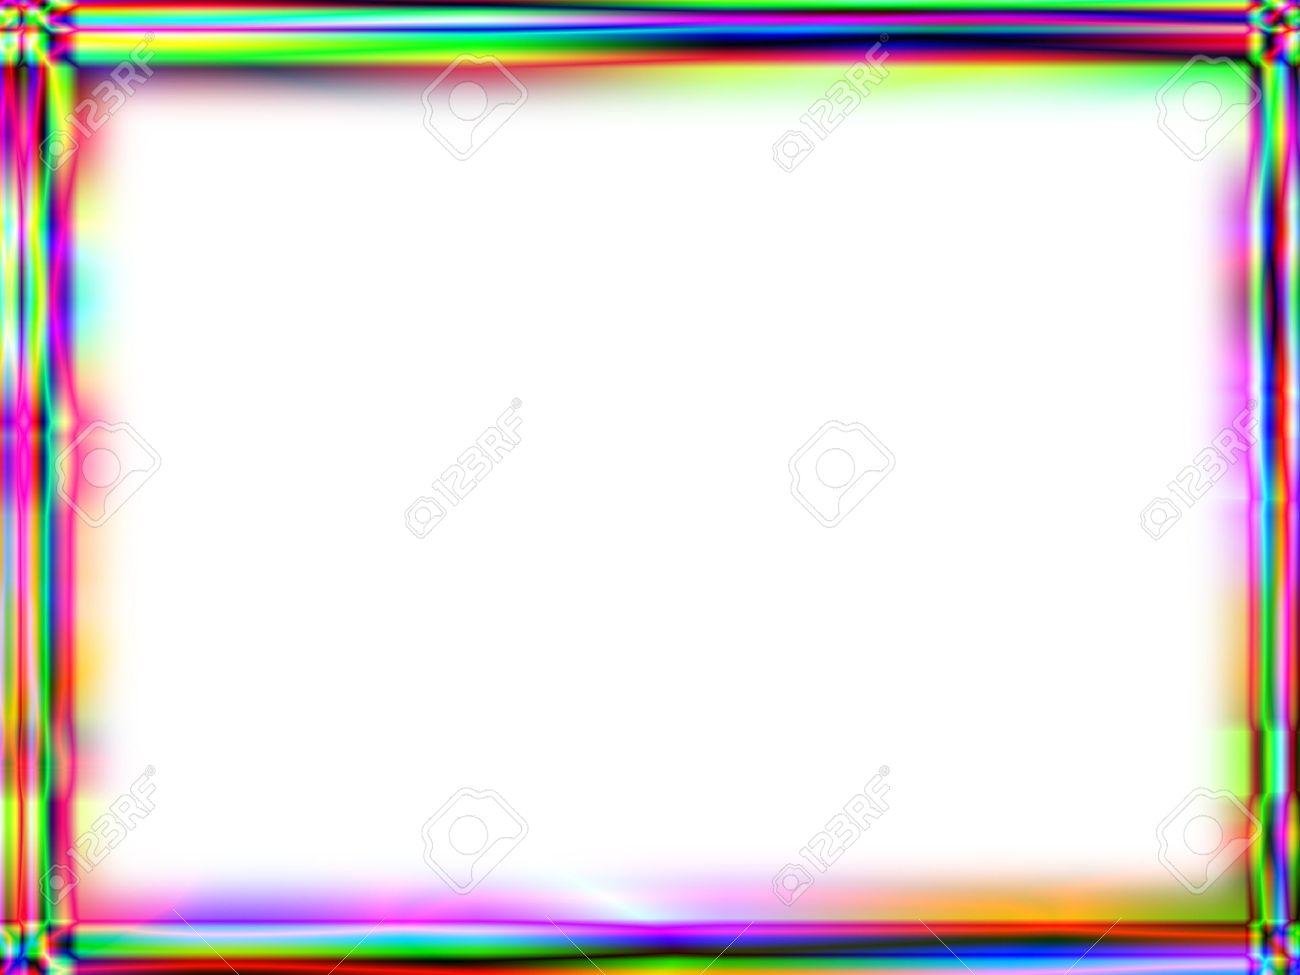 Asombroso Marco De La Imagen De Arco Iris Imagen - Ideas ...